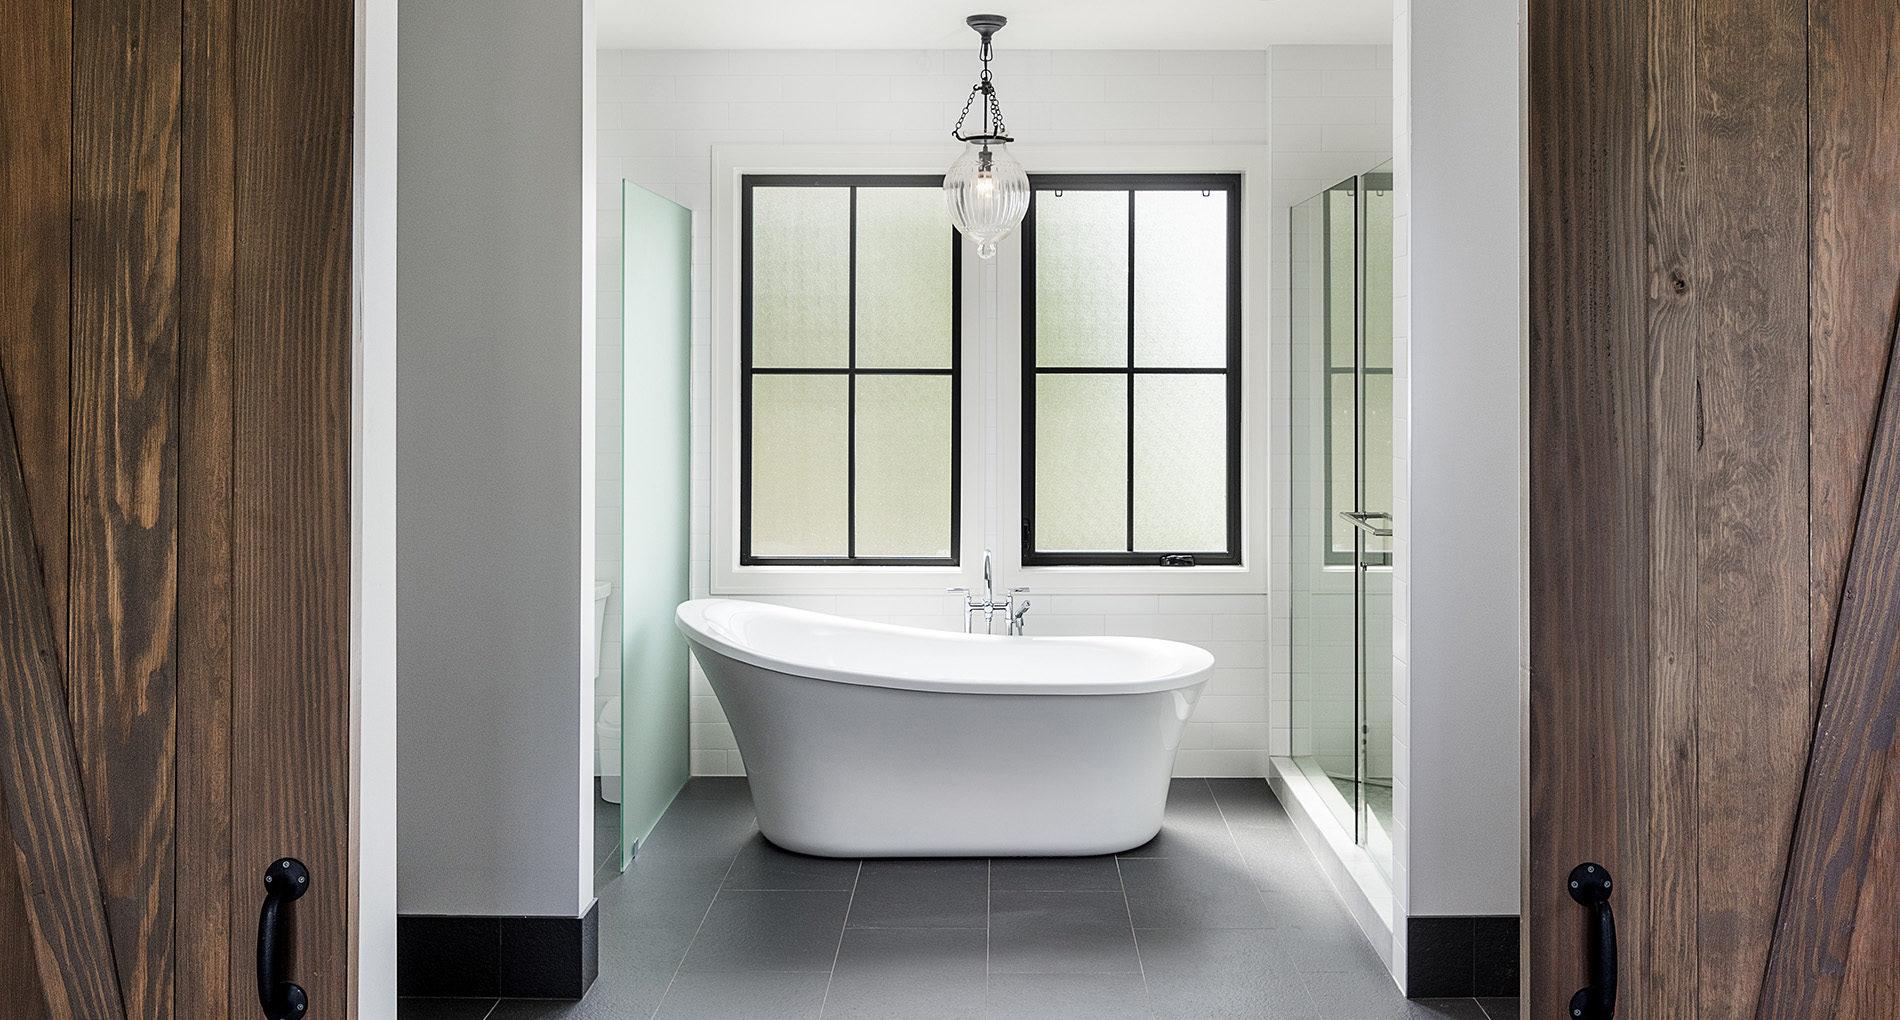 Bathroom Renovation Tricities Adamsroad Slider